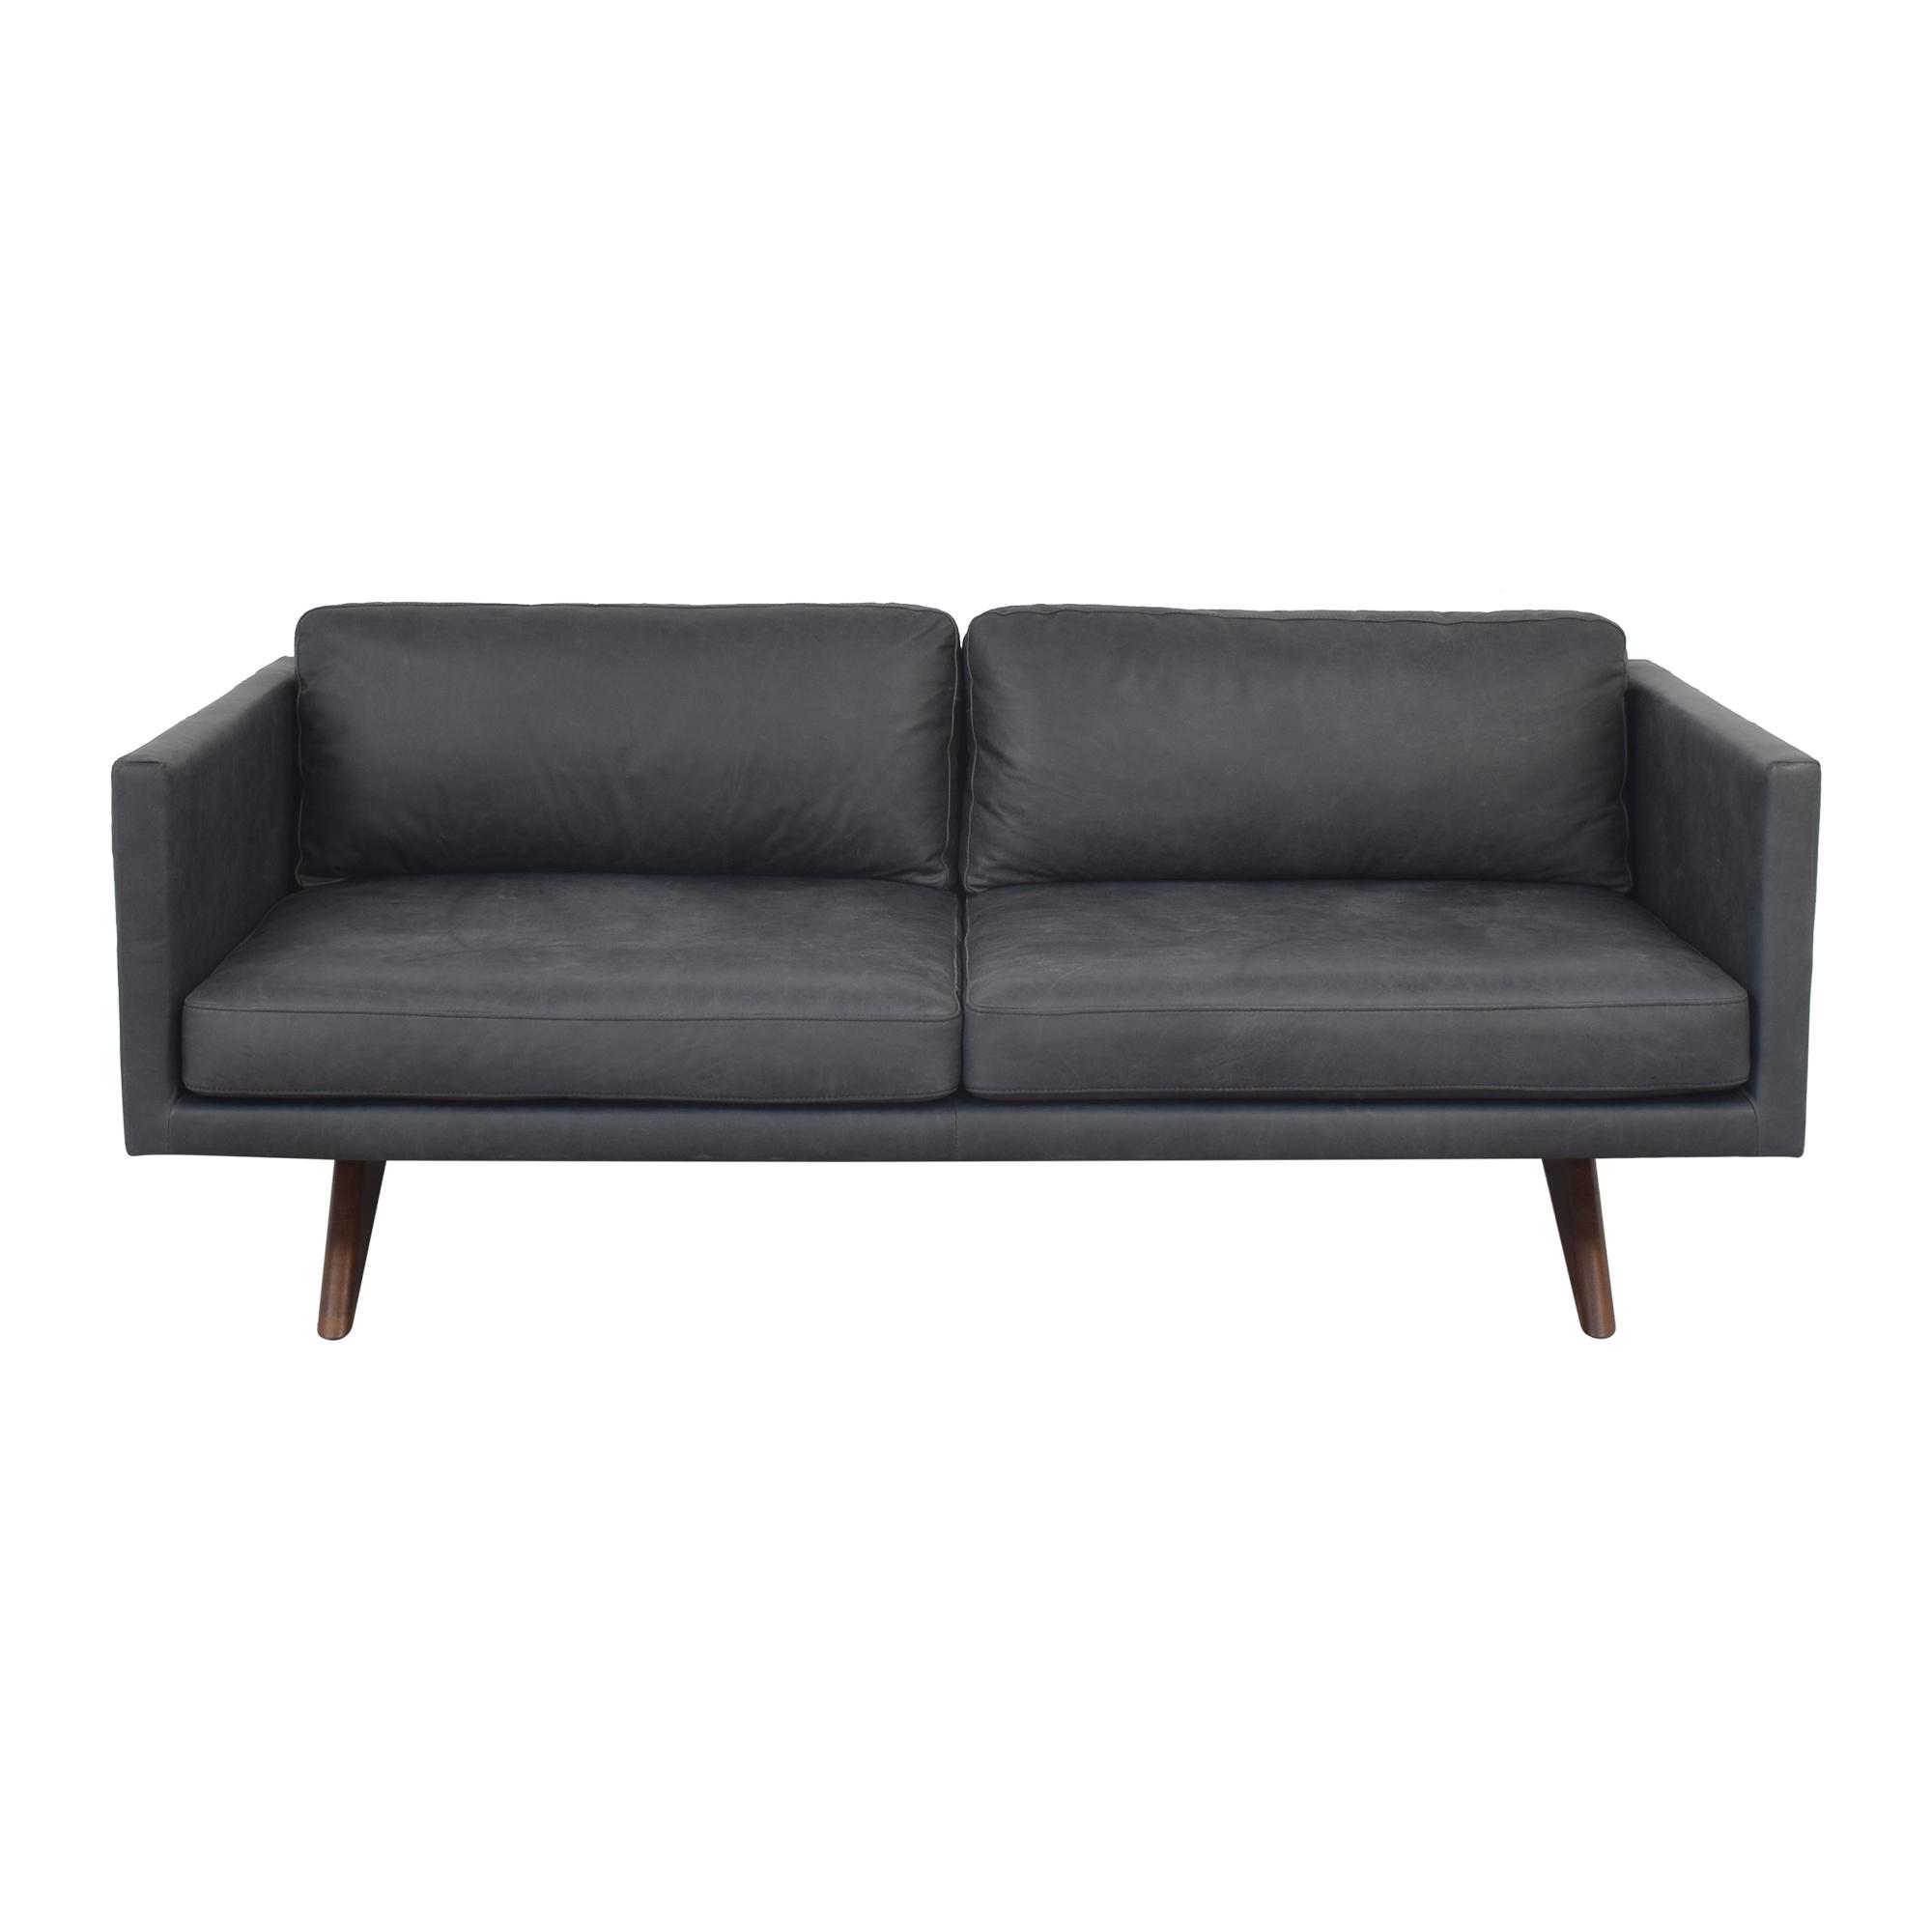 West Elm West Elm Modern Two Cushion Sofa second hand